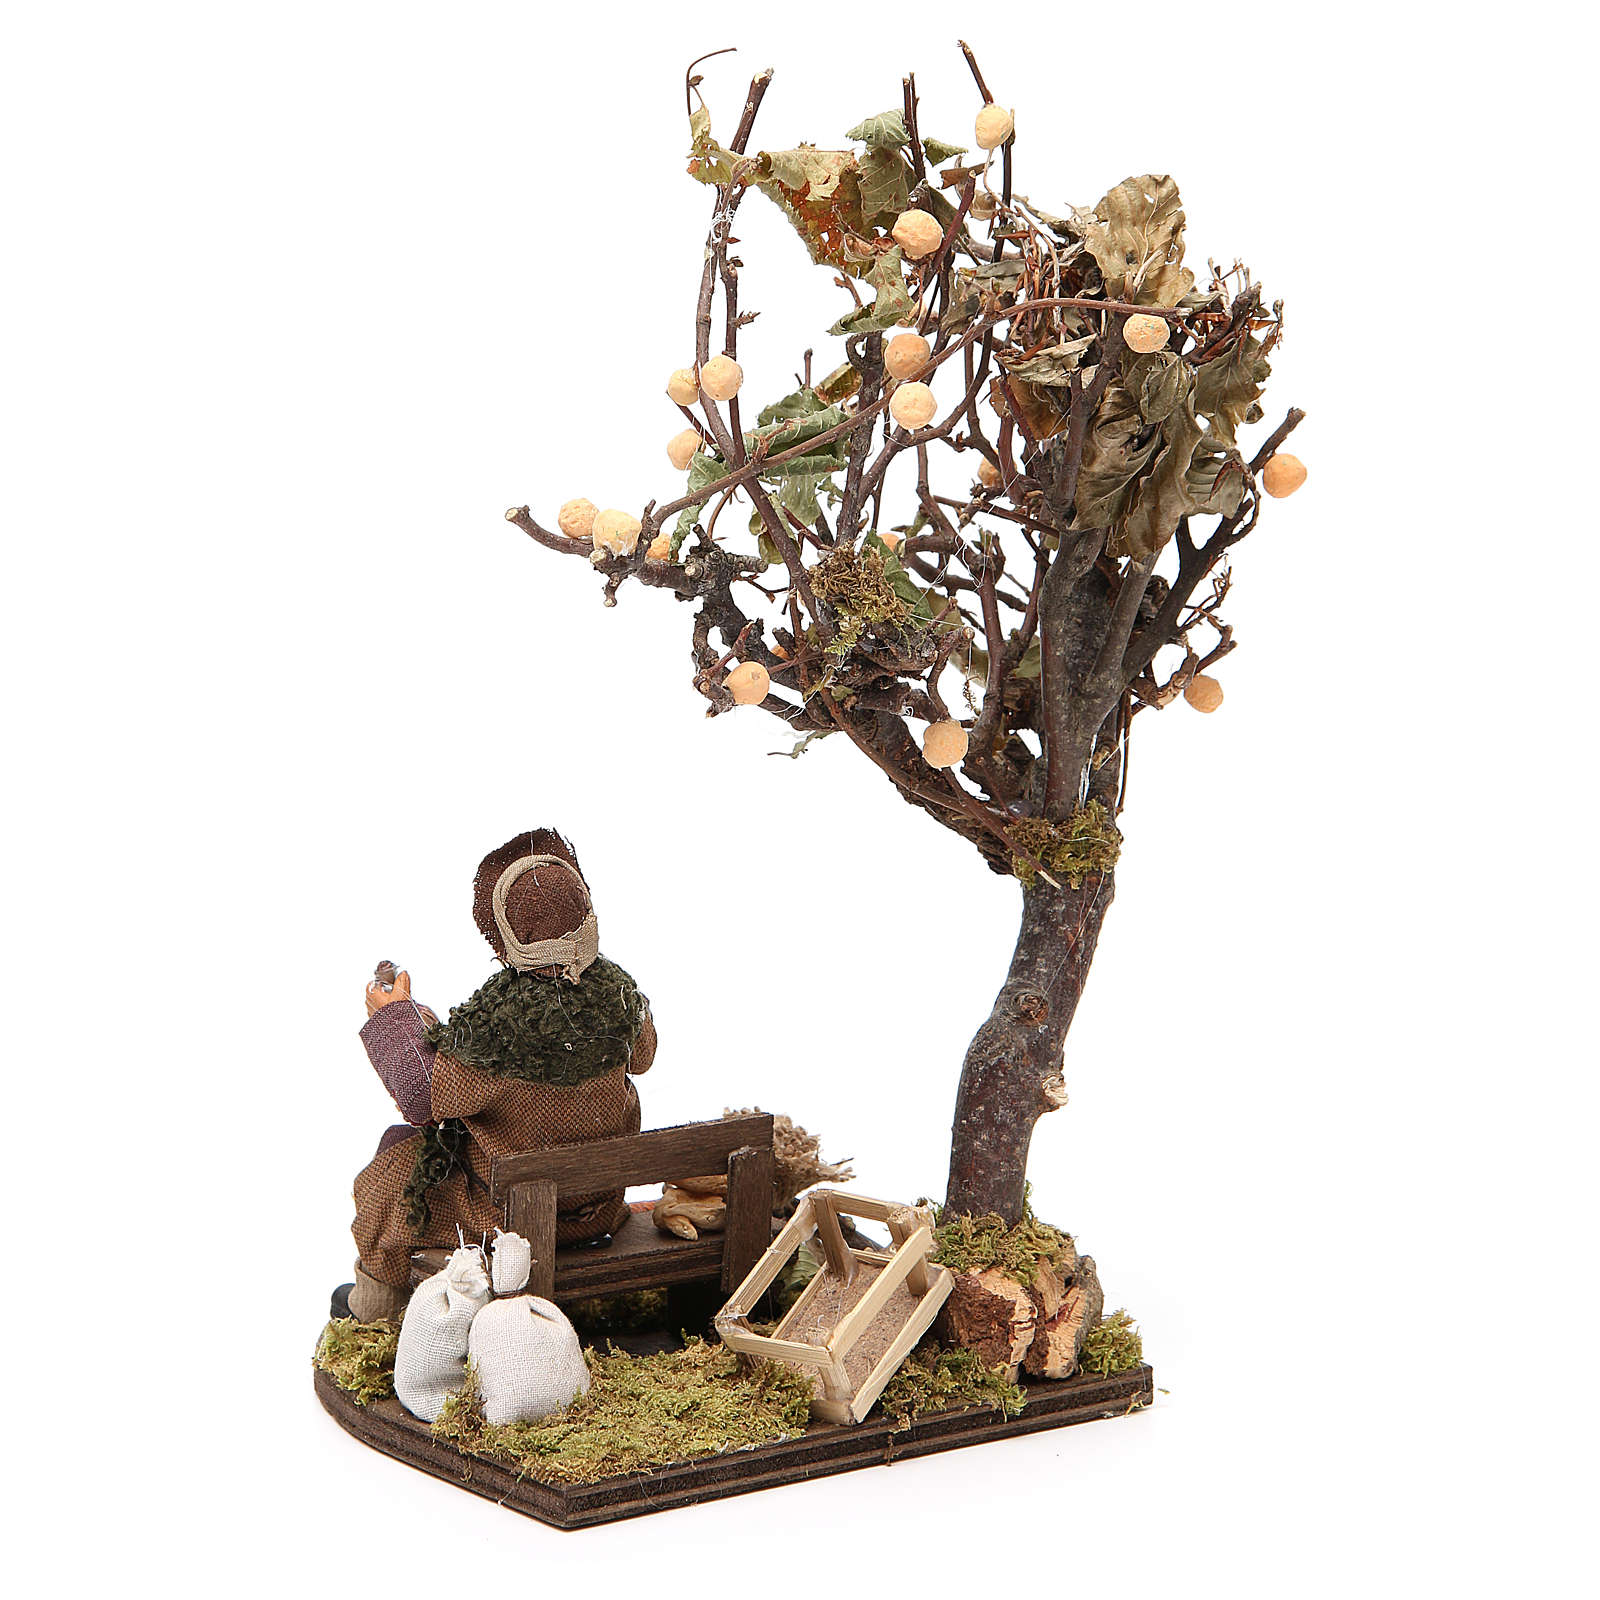 Wayfarer with dog on bench and tree, Neapolitan nativity 12cm 4